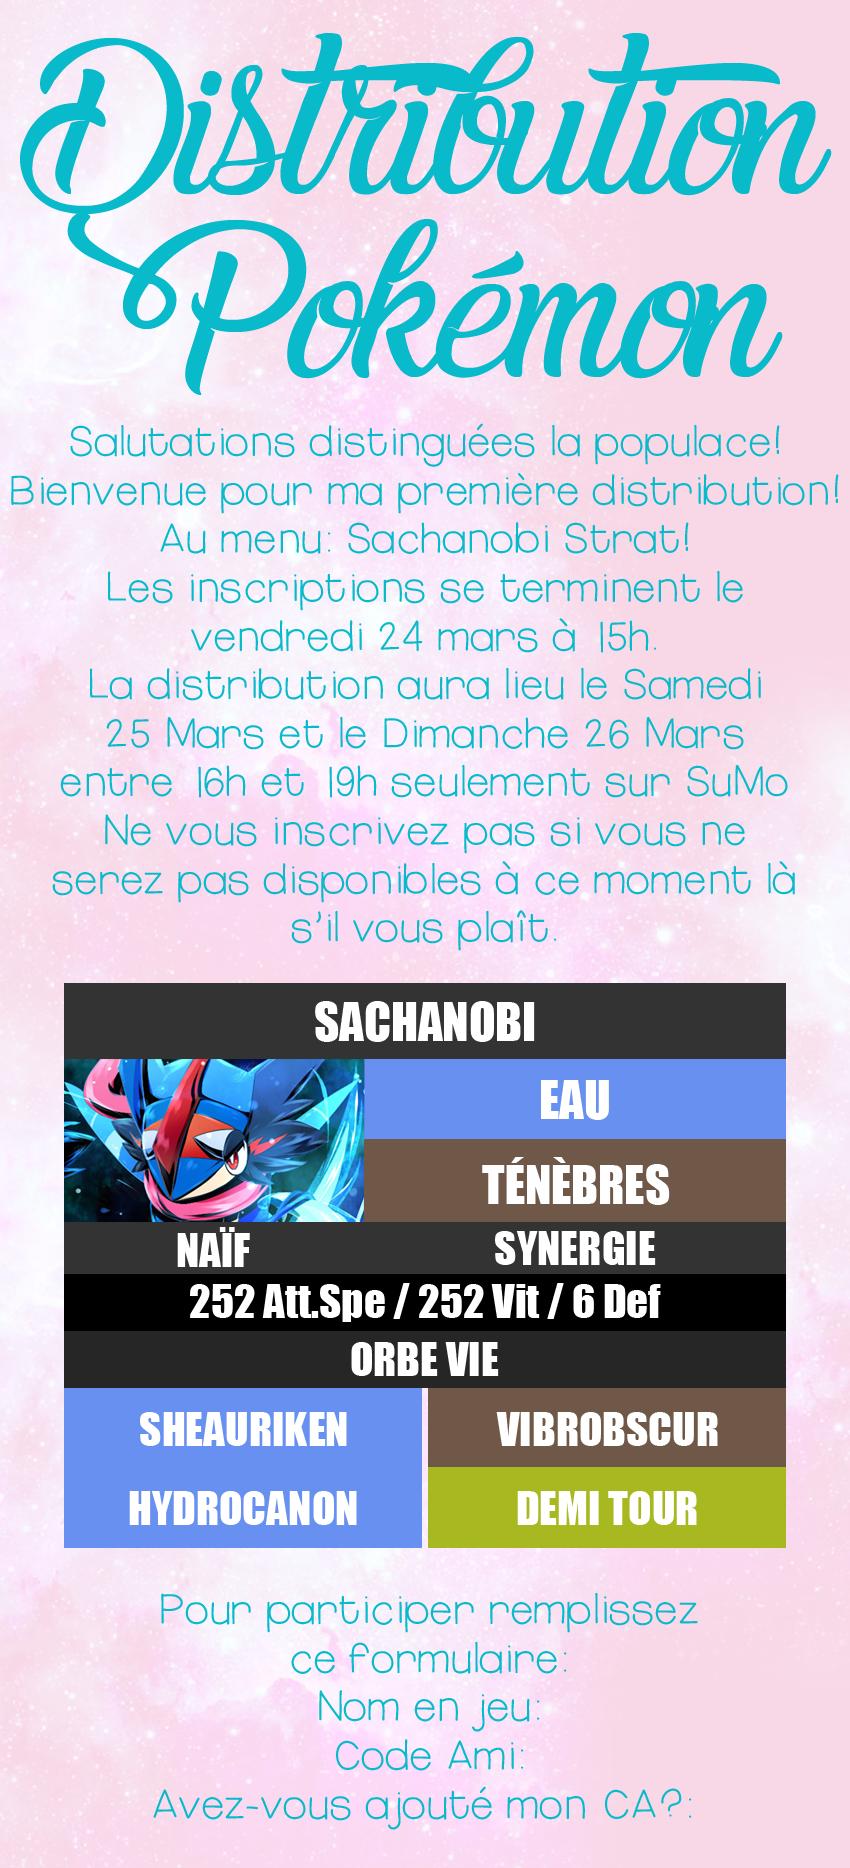 [Cloturée] Distribution Sachanobi Stratégique par Ashizo! 1489690123-distrib